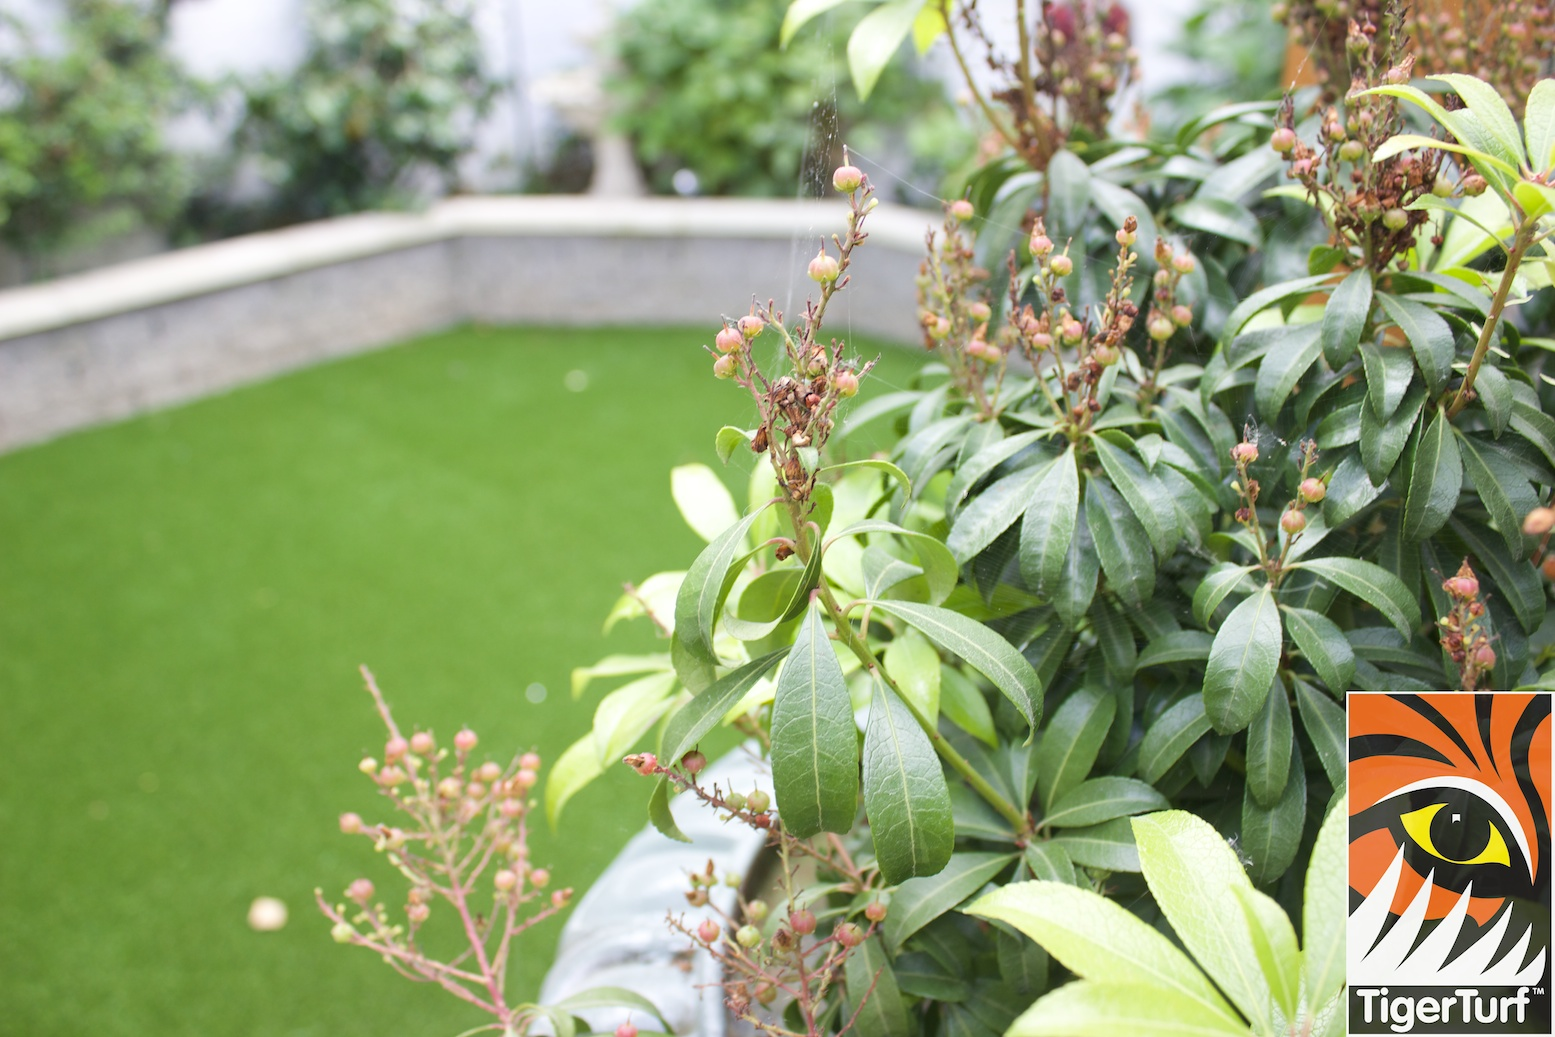 Garden designed with TigerTurf Lawn